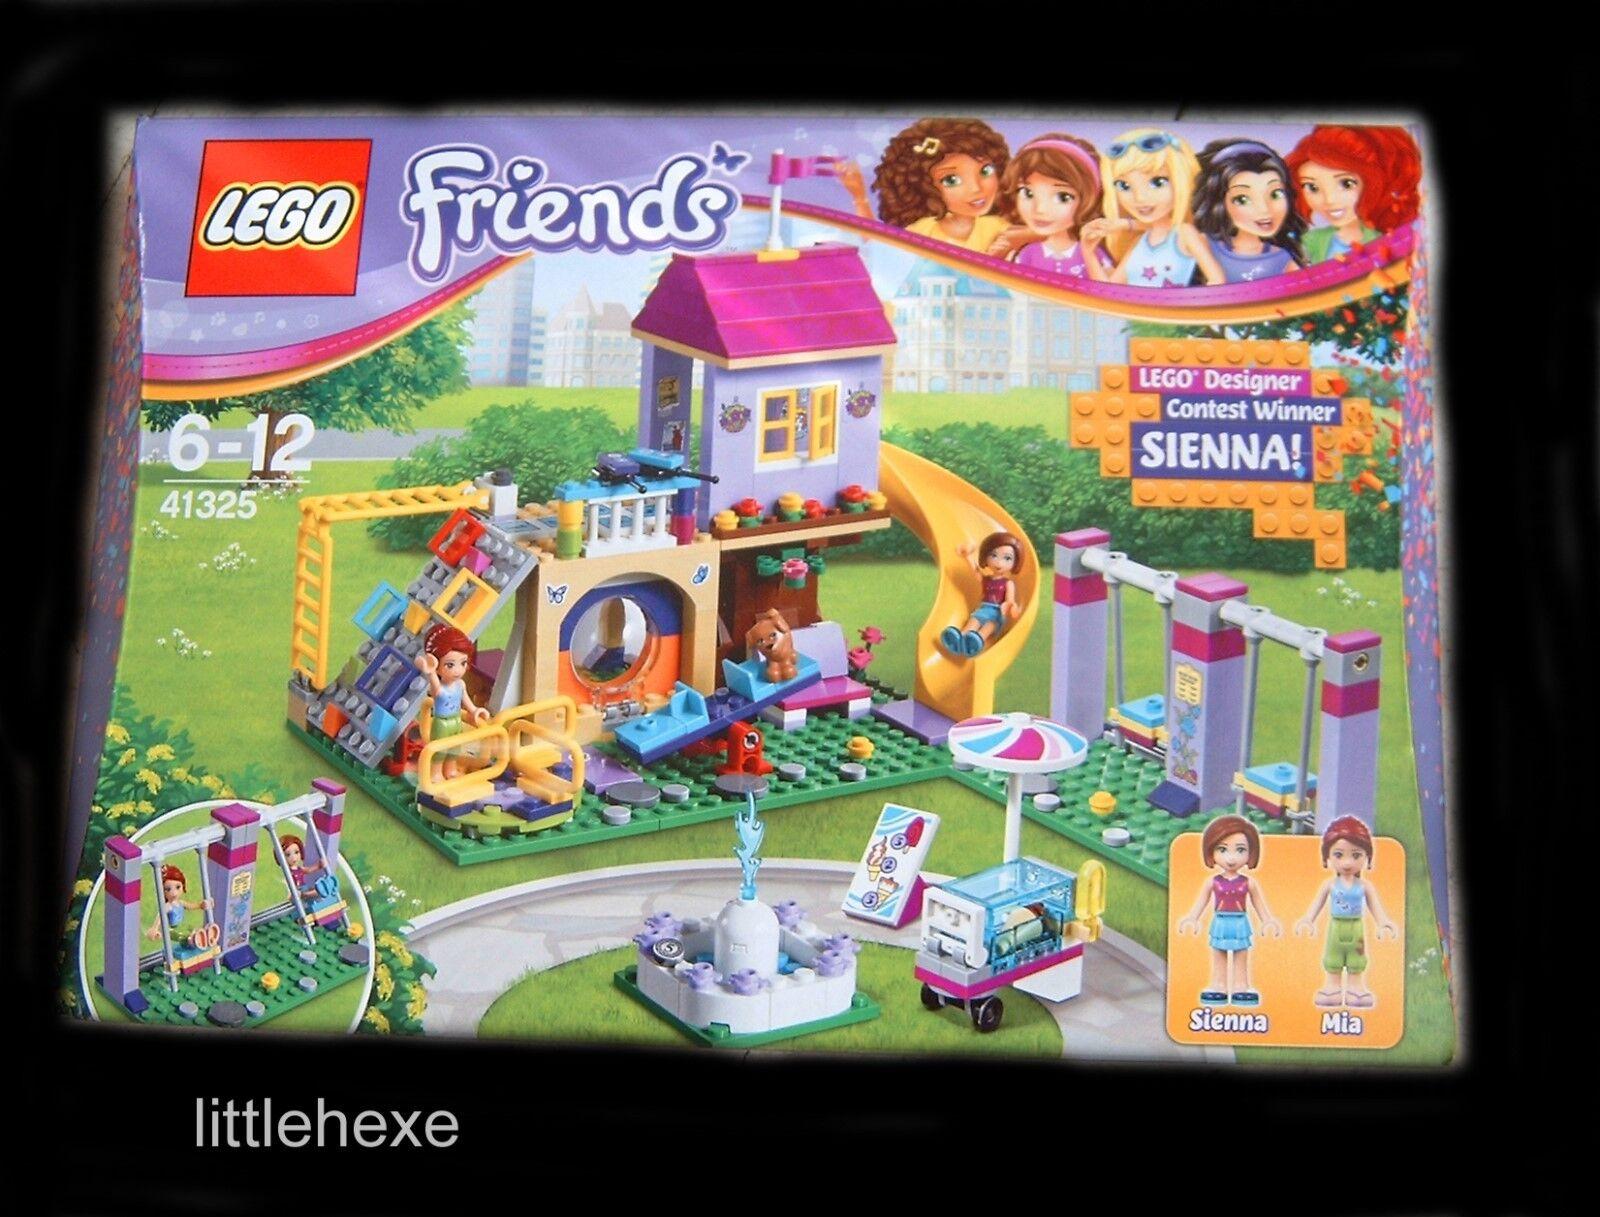 LEGO Friends 41325 Heartlake City Terrain de jeu Nouveau/Neuf Nouveau/Neuf Nouveau/Neuf dans sa boîte 9c79c6